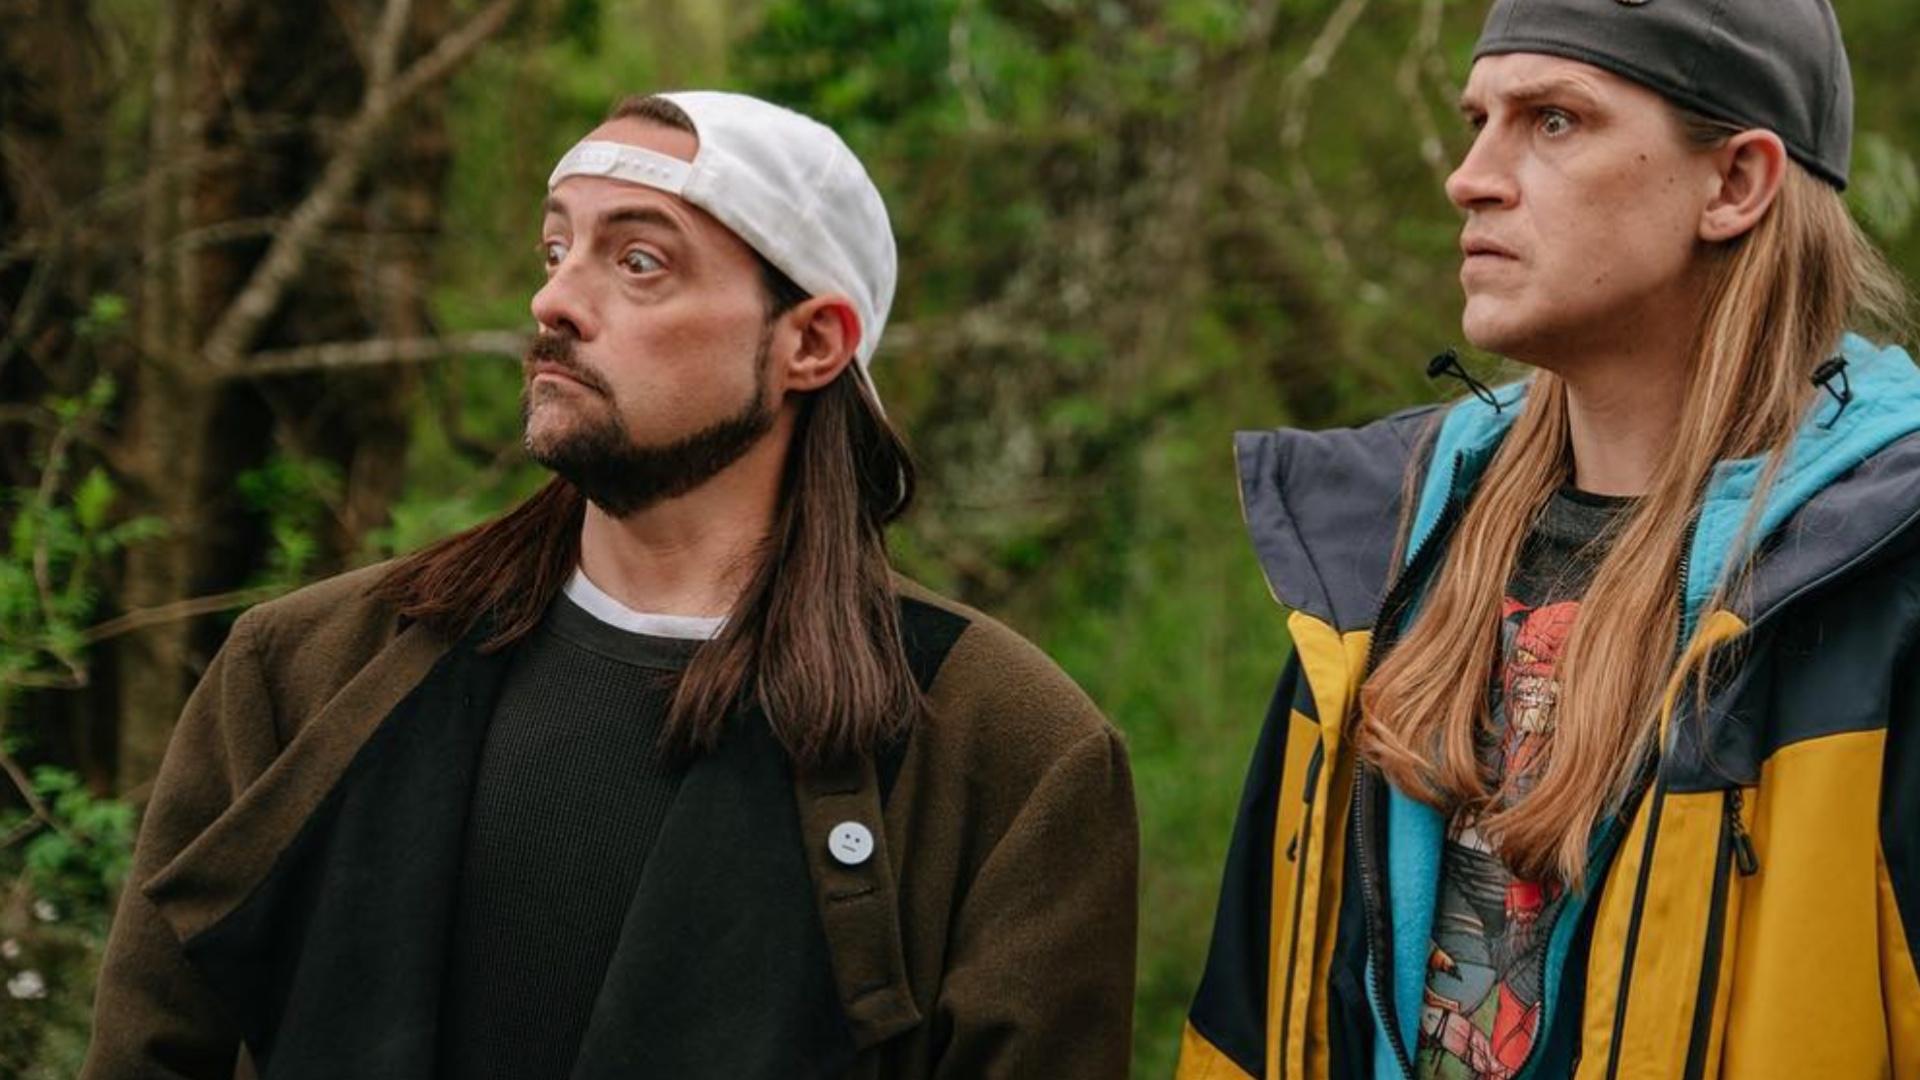 SDCC: Jay & Silent Bob Reboot si mostra nel primo trailer thumbnail